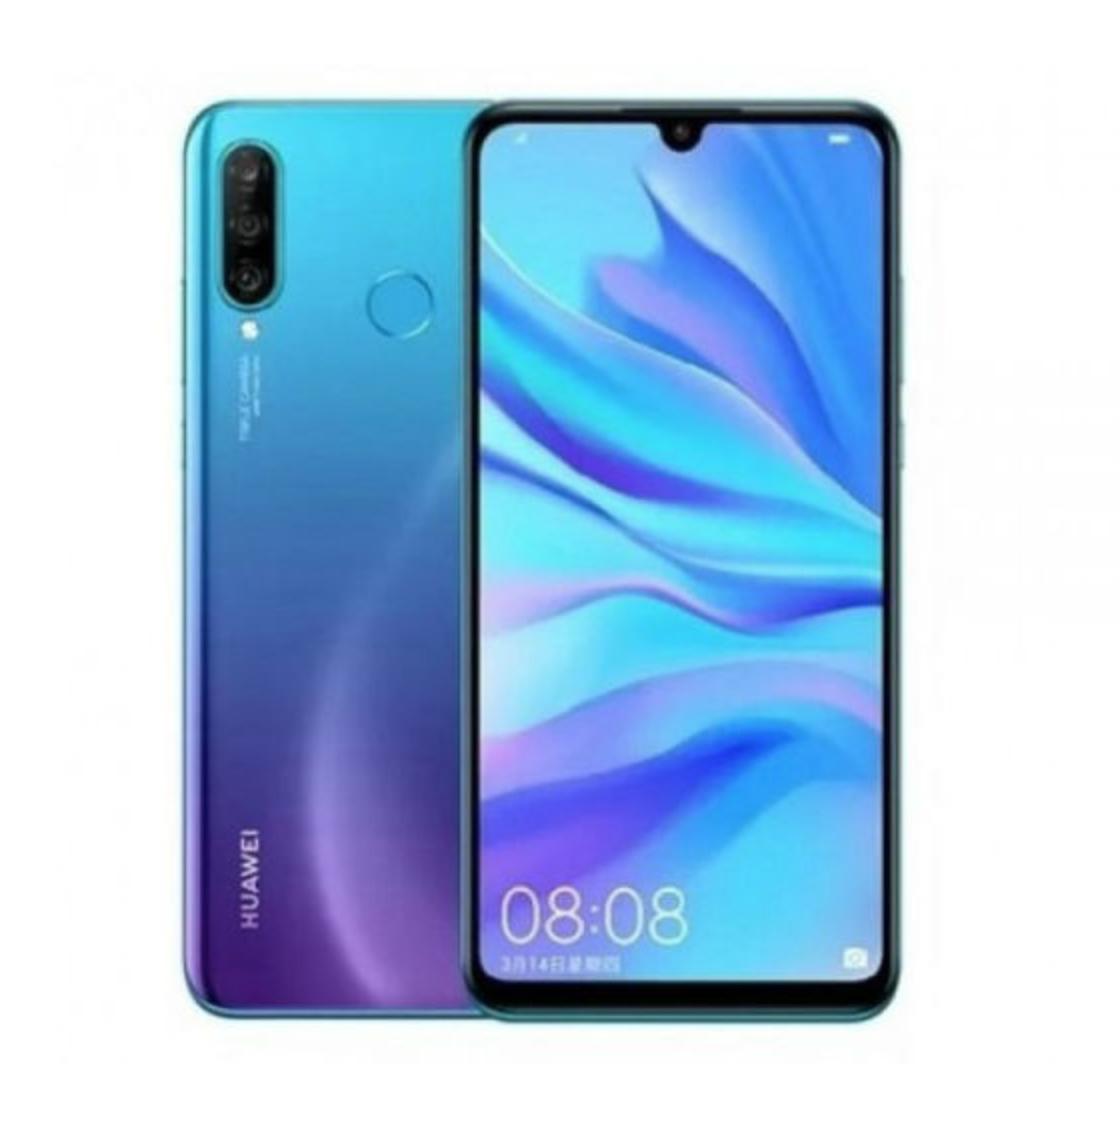 Huawei P30 lite 6GB/128GB Dual Sim Blue - £232.99 - eglobalcentraluk